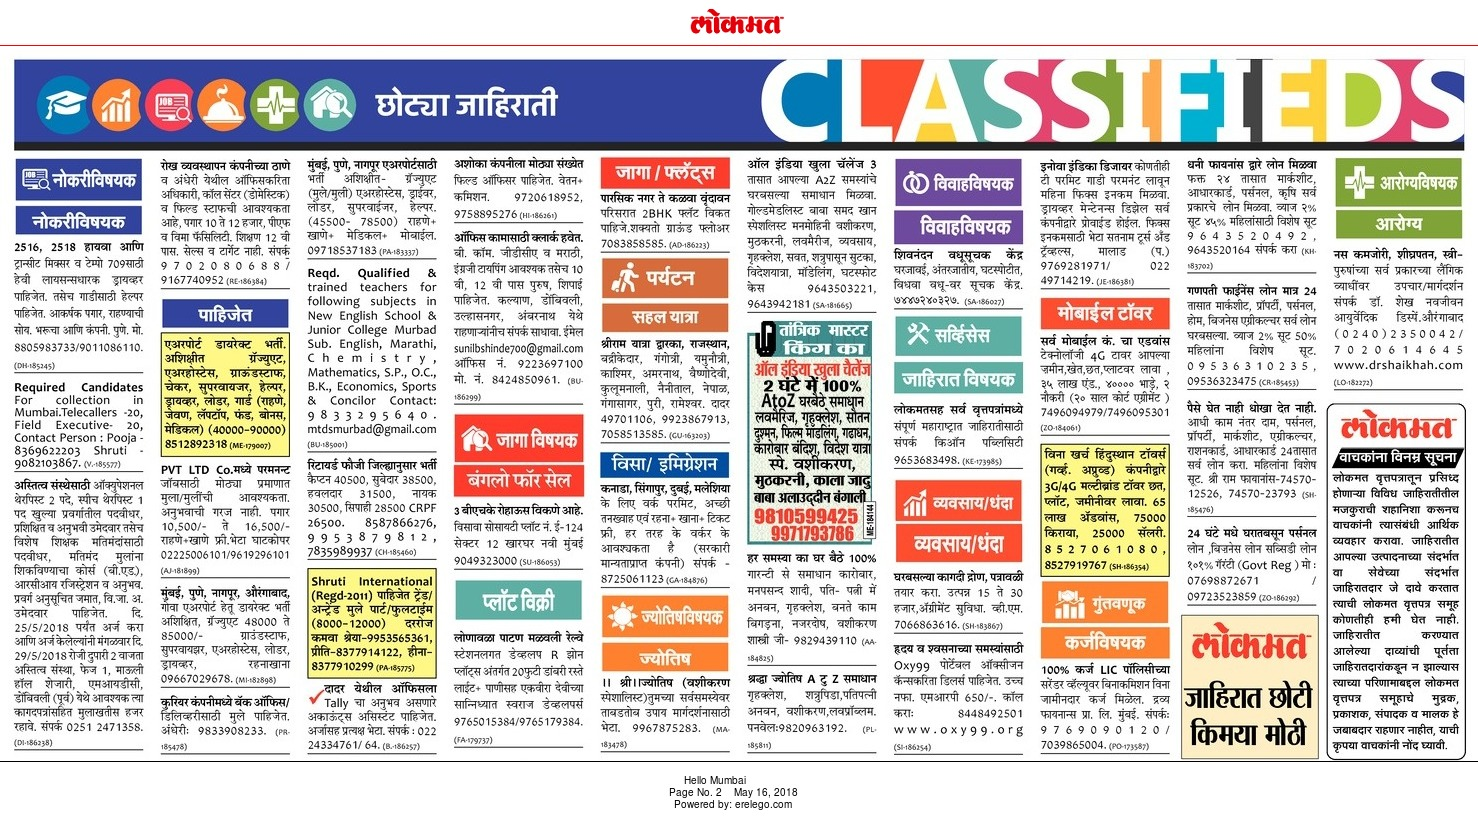 navjeevan newspaper classified के लिए इमेज परिणाम